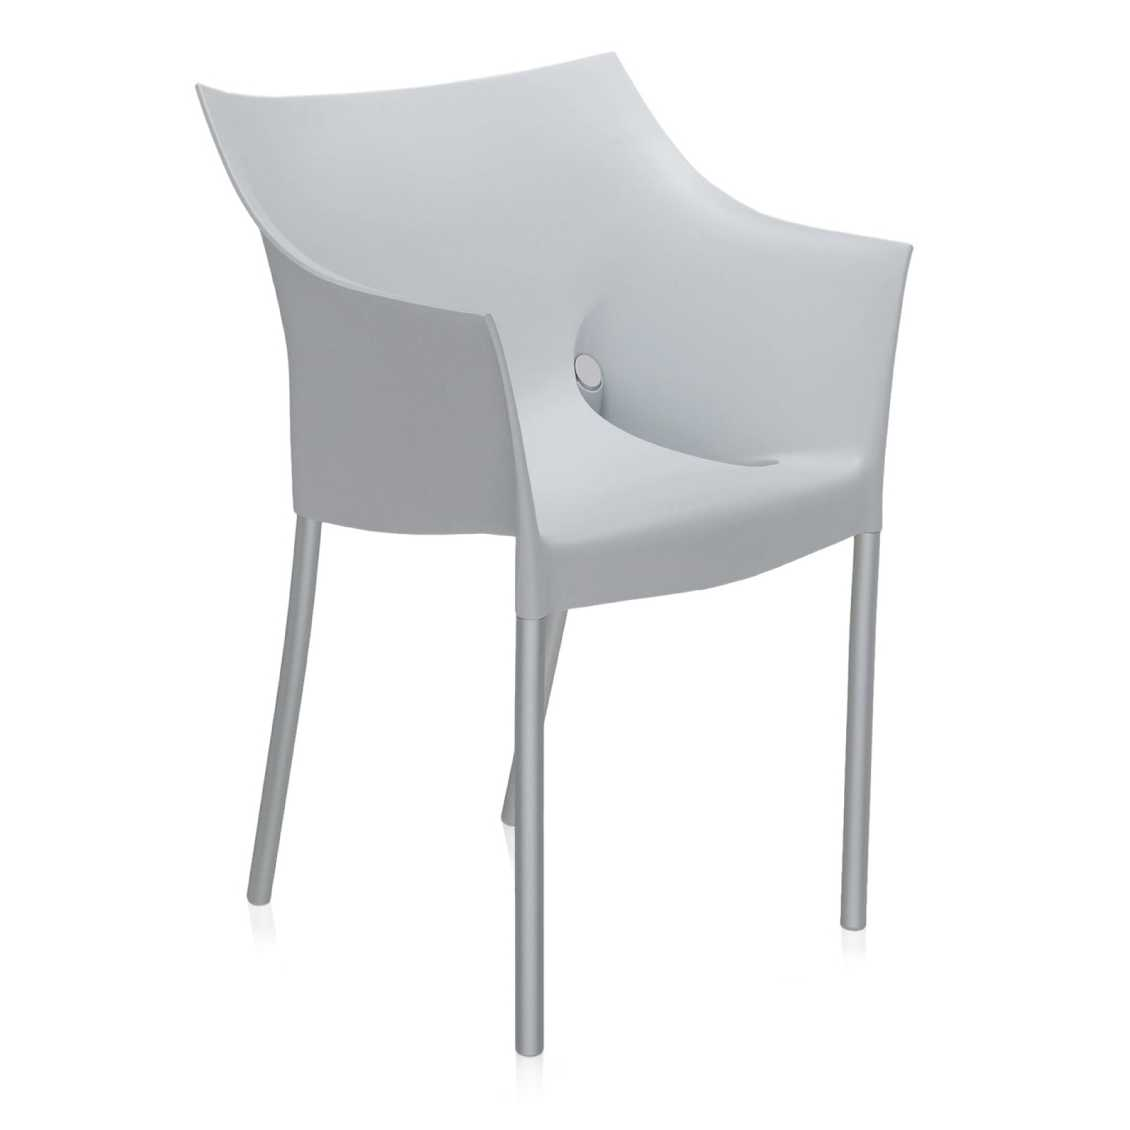 dr-no-stoel-lavendel-grijs-kartell_1